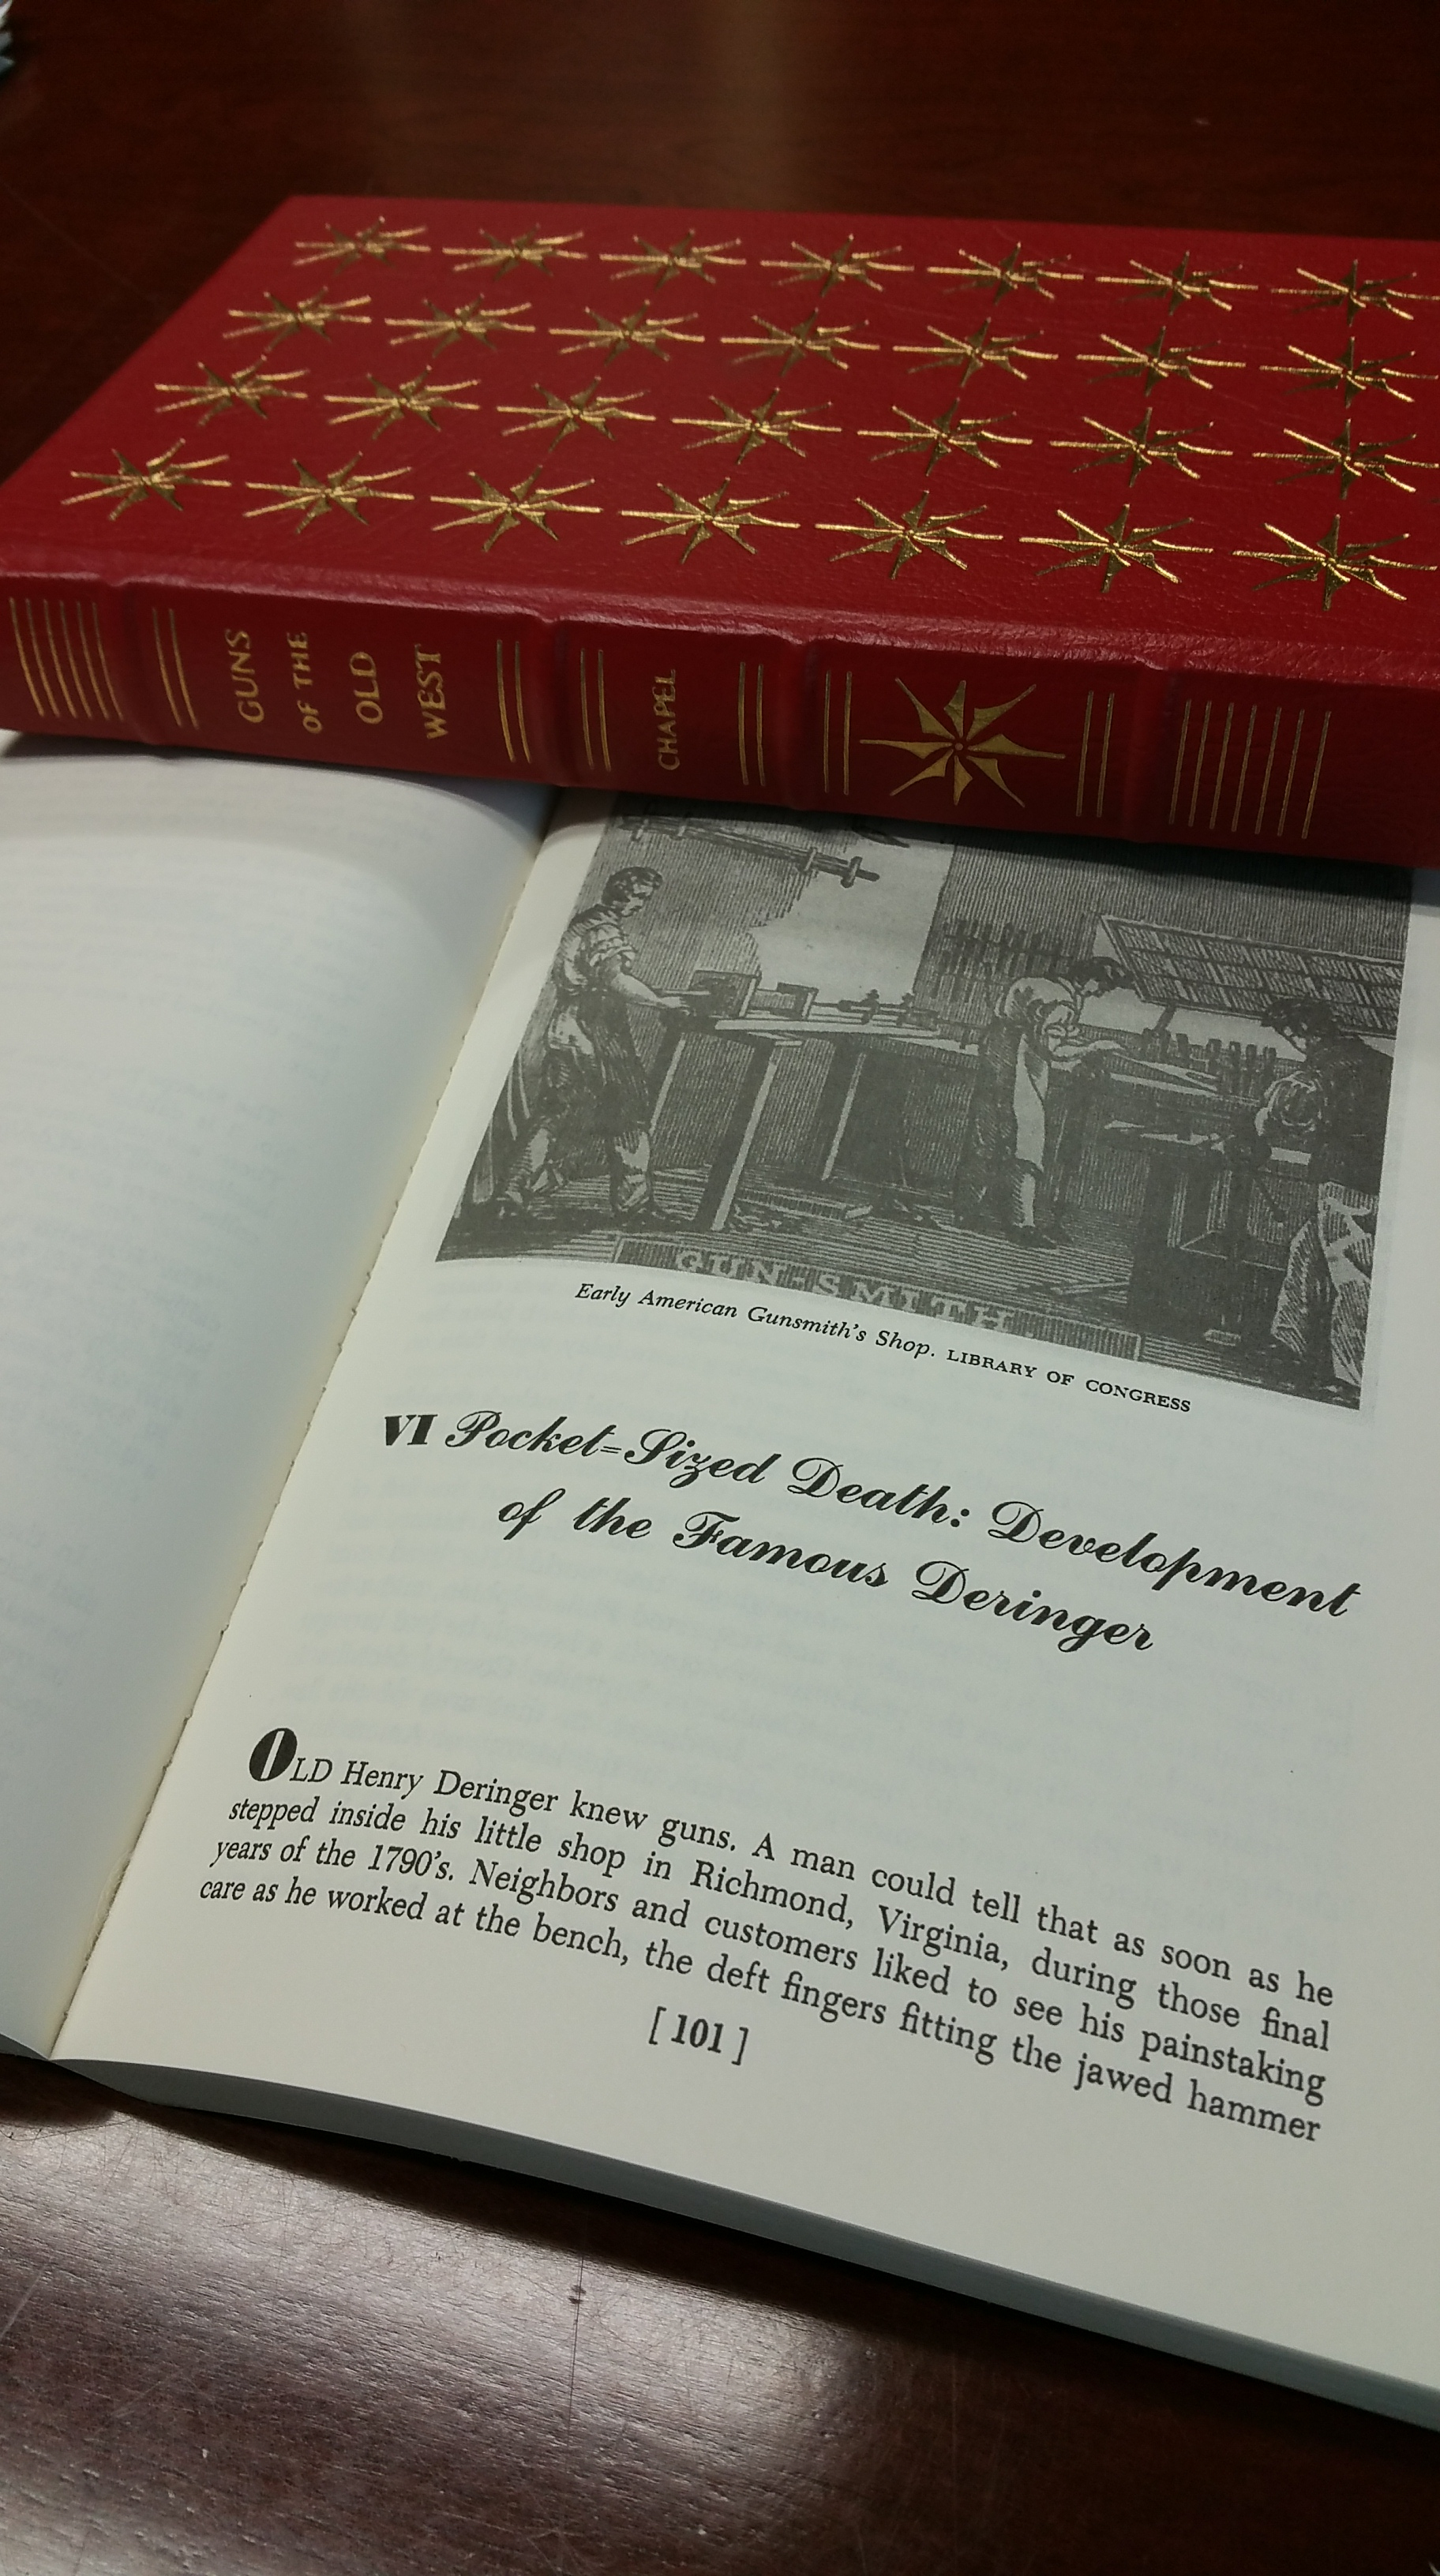 Pocket-Sized Death: Development of the Famous Deringer